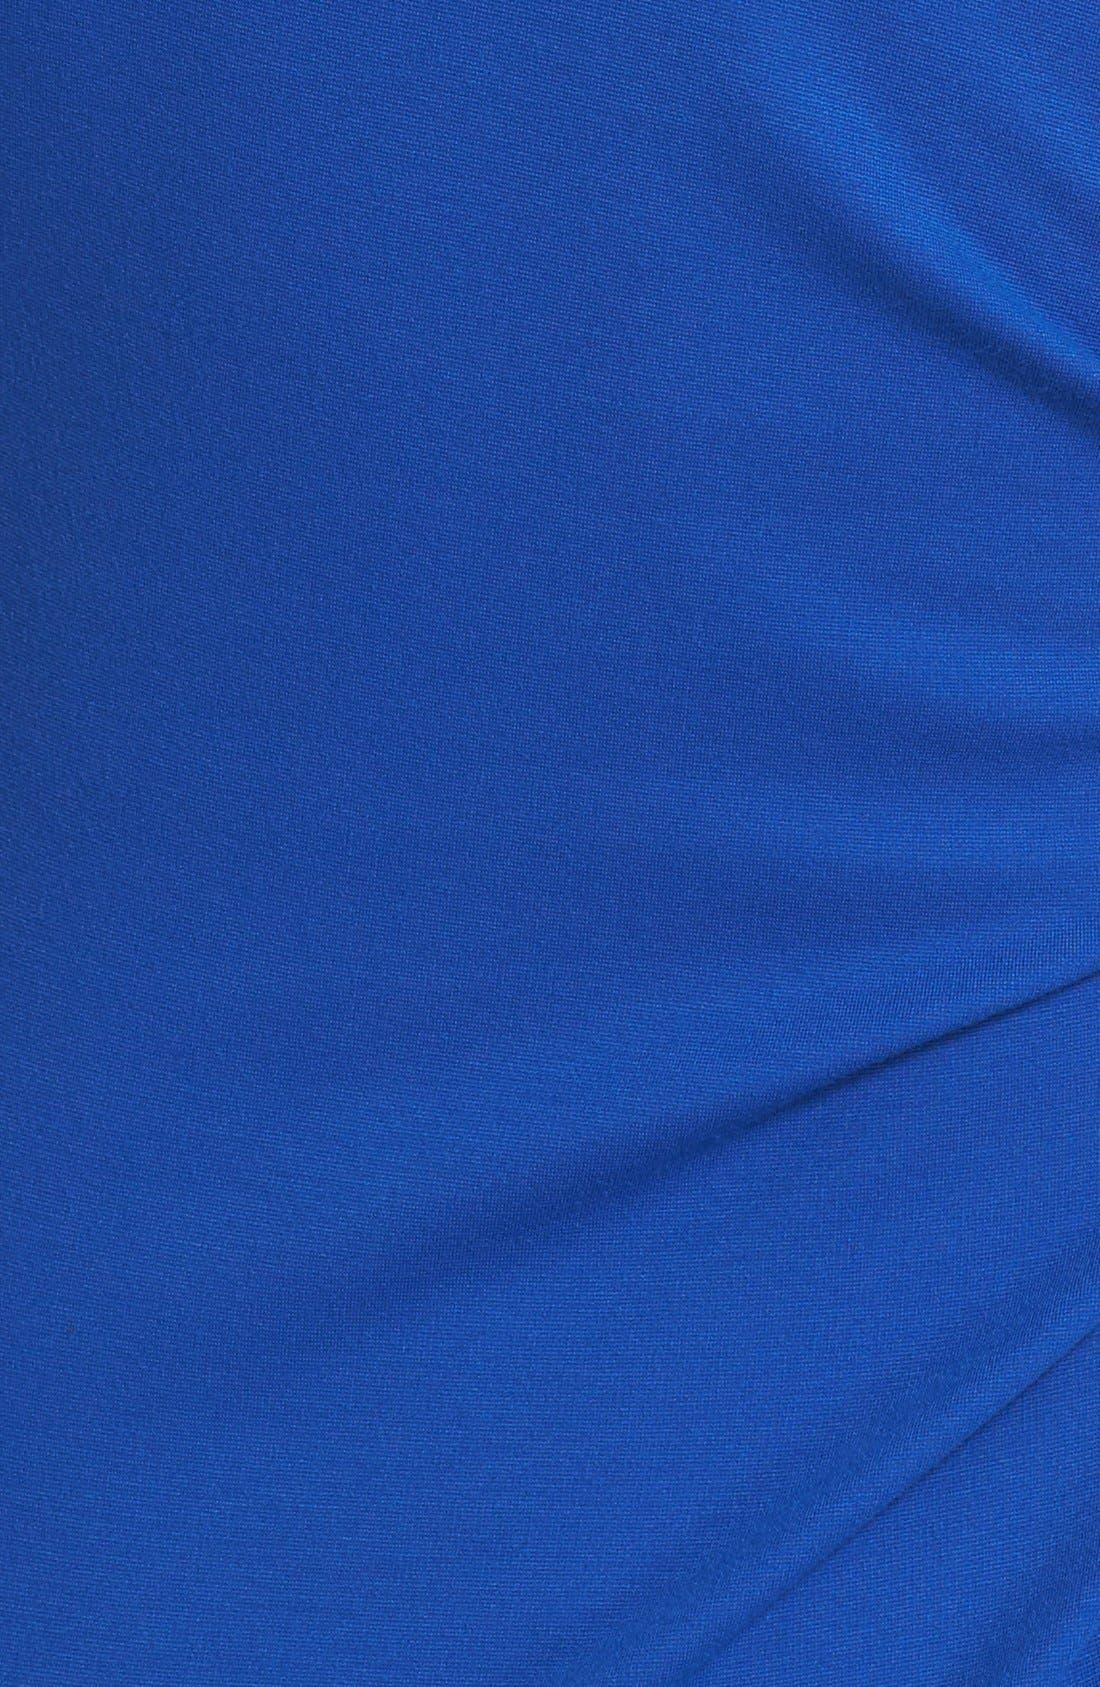 Alternate Image 3  - Lafayette 148 New York Drape Neck Ponte Dress (Regular & Petite)